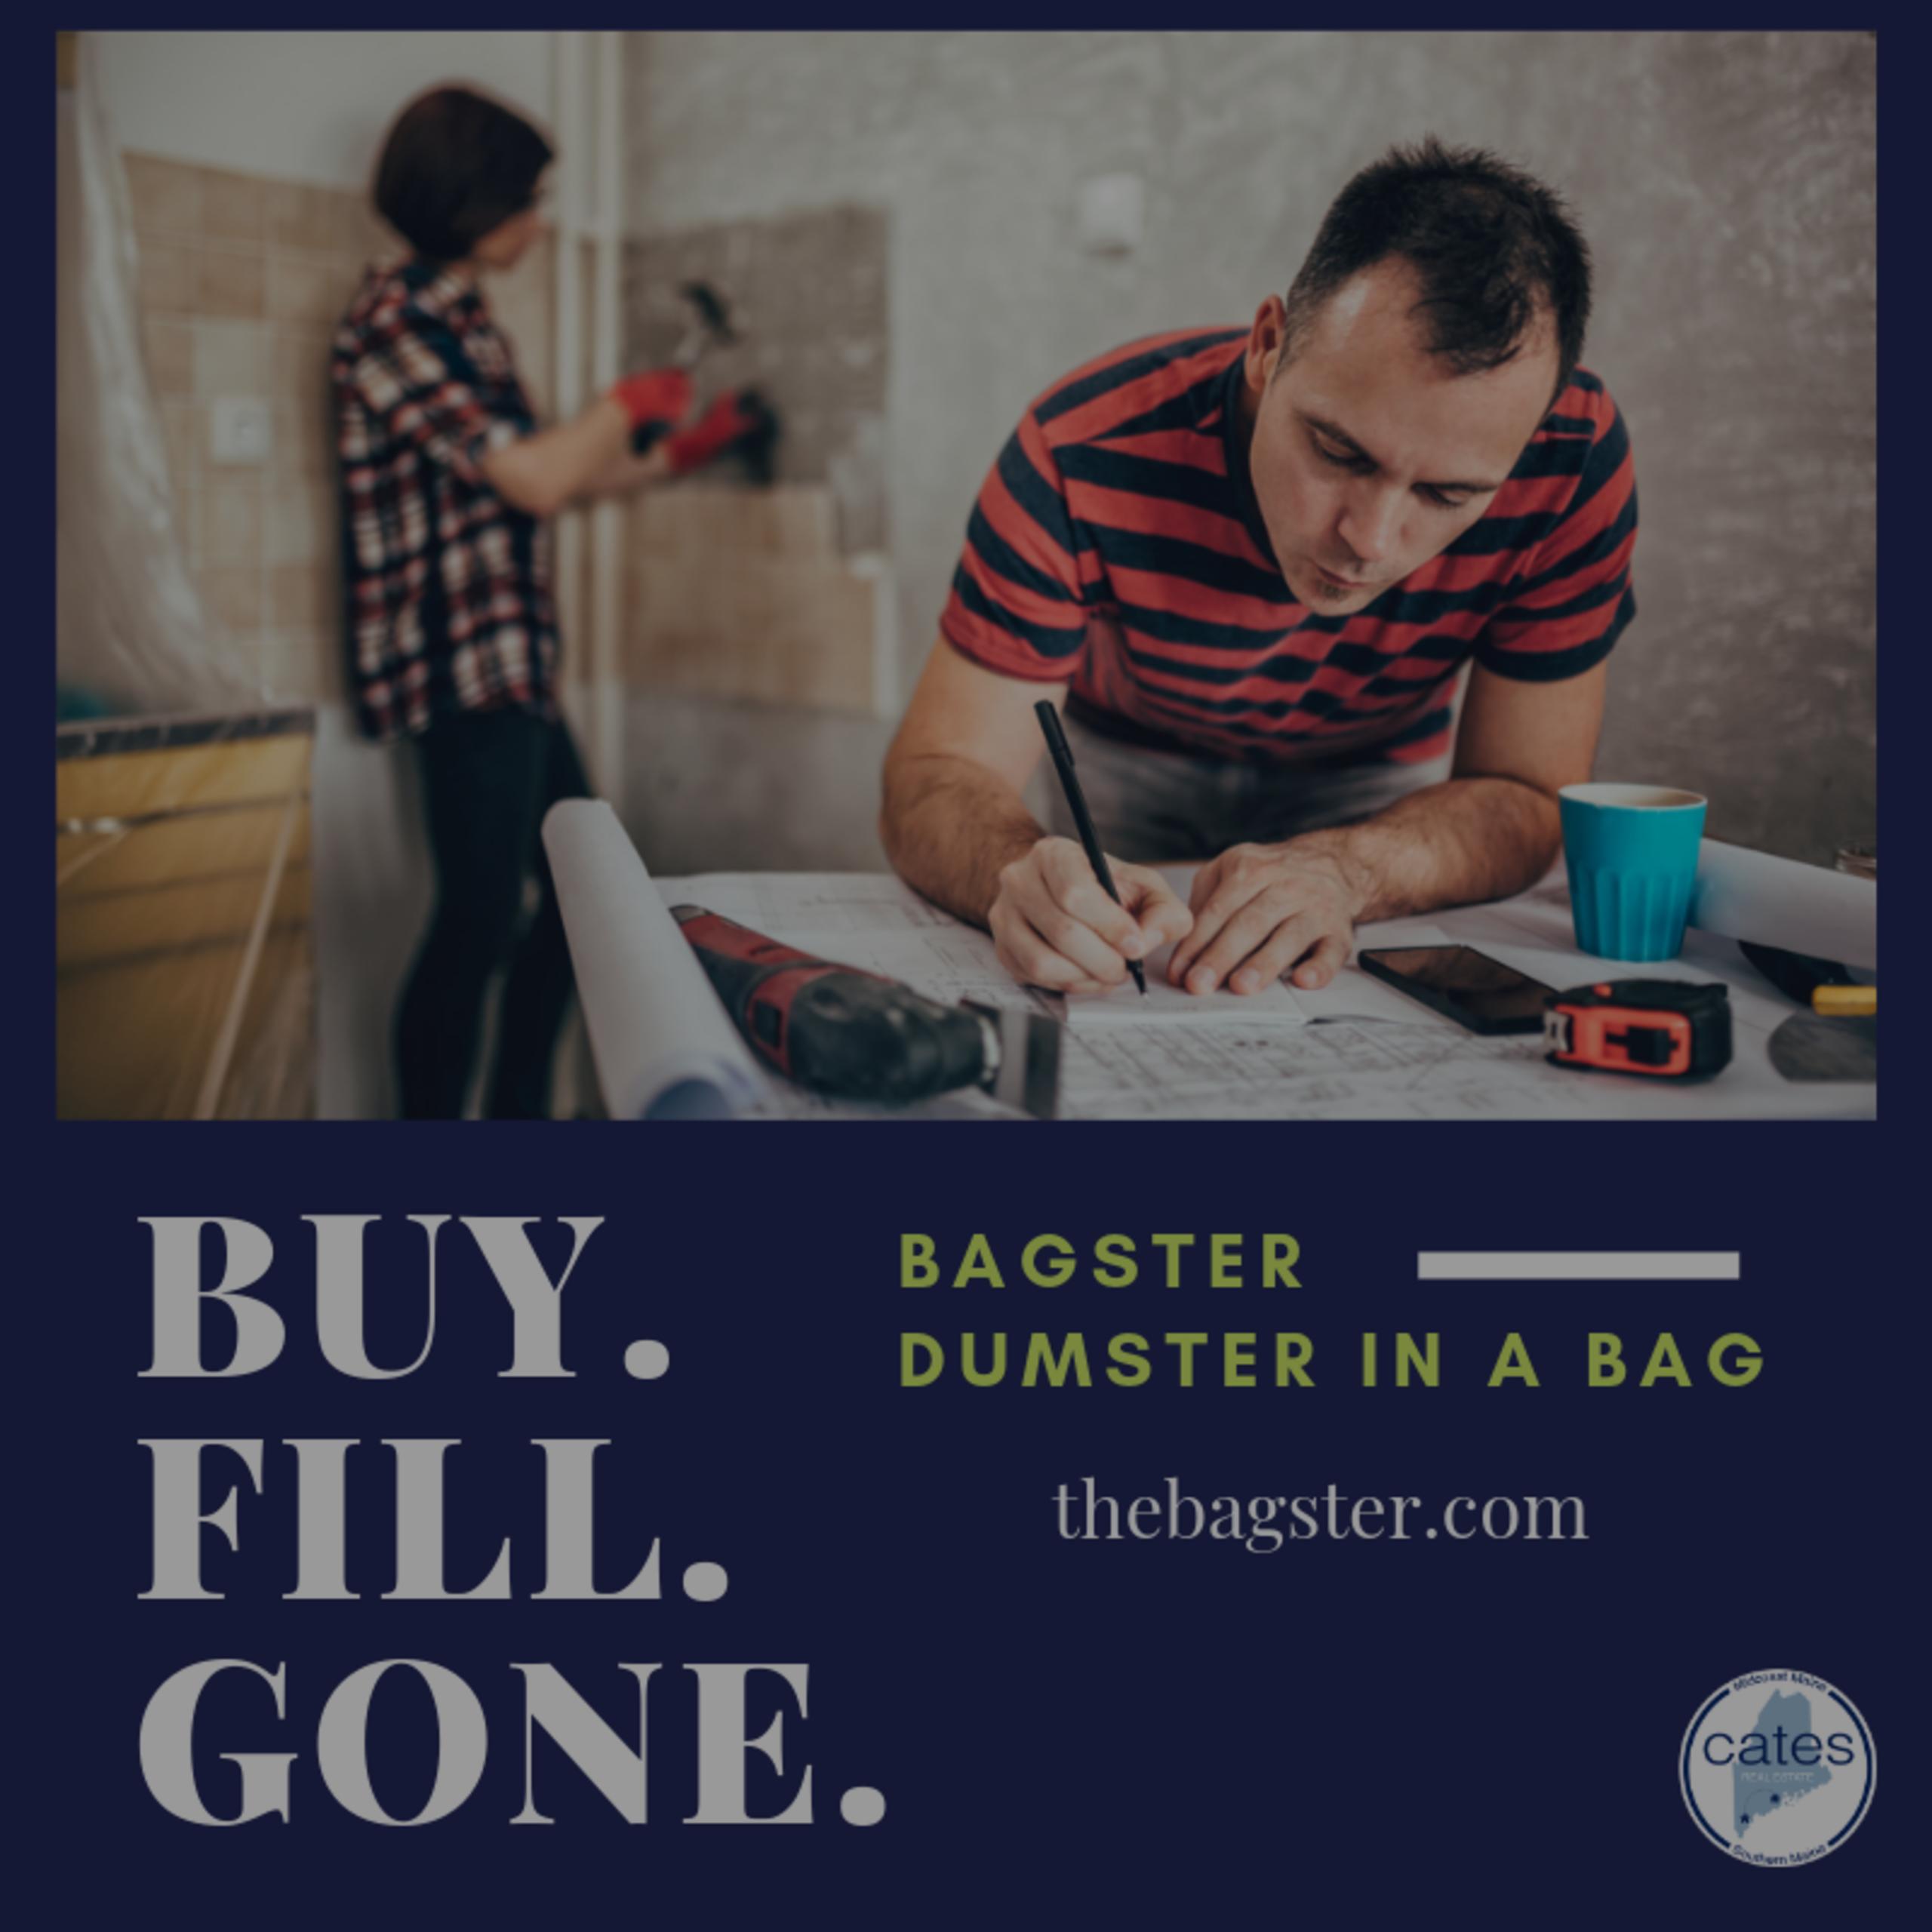 Bagster: Dumpter in a Bag